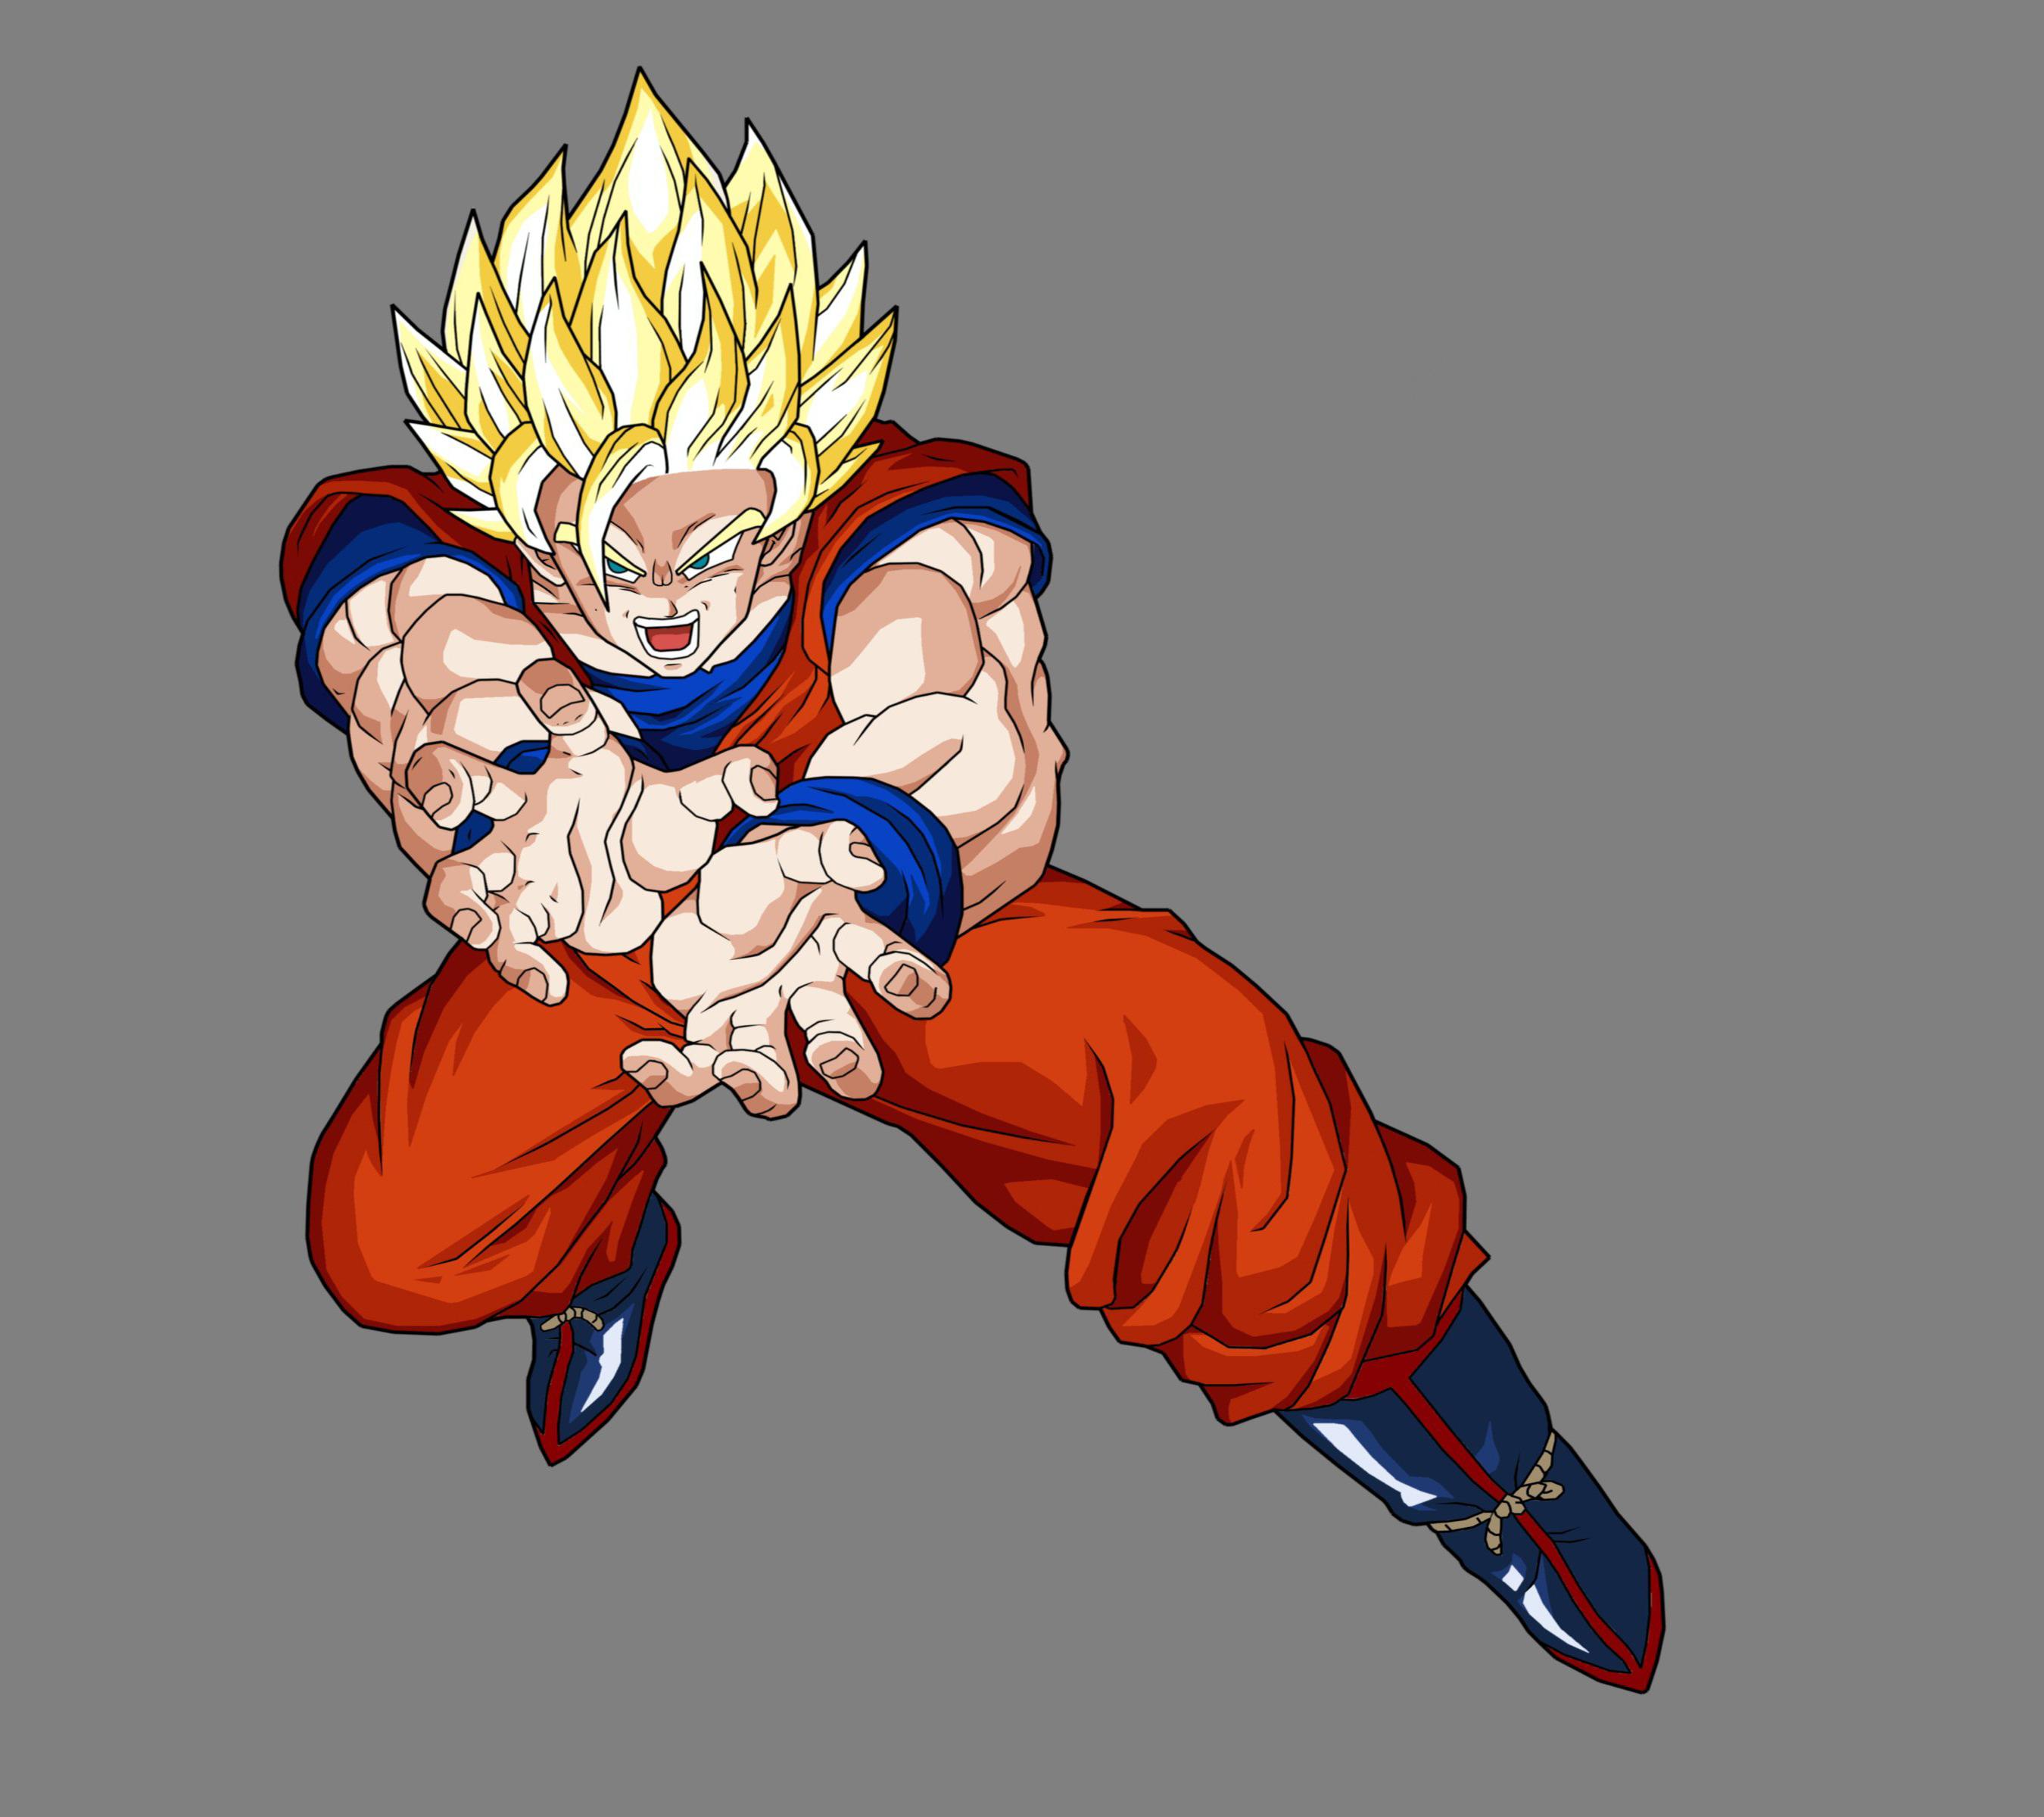 Goku Ssj2 Kamehameha Fondo De Pantalla Hd Fondo De